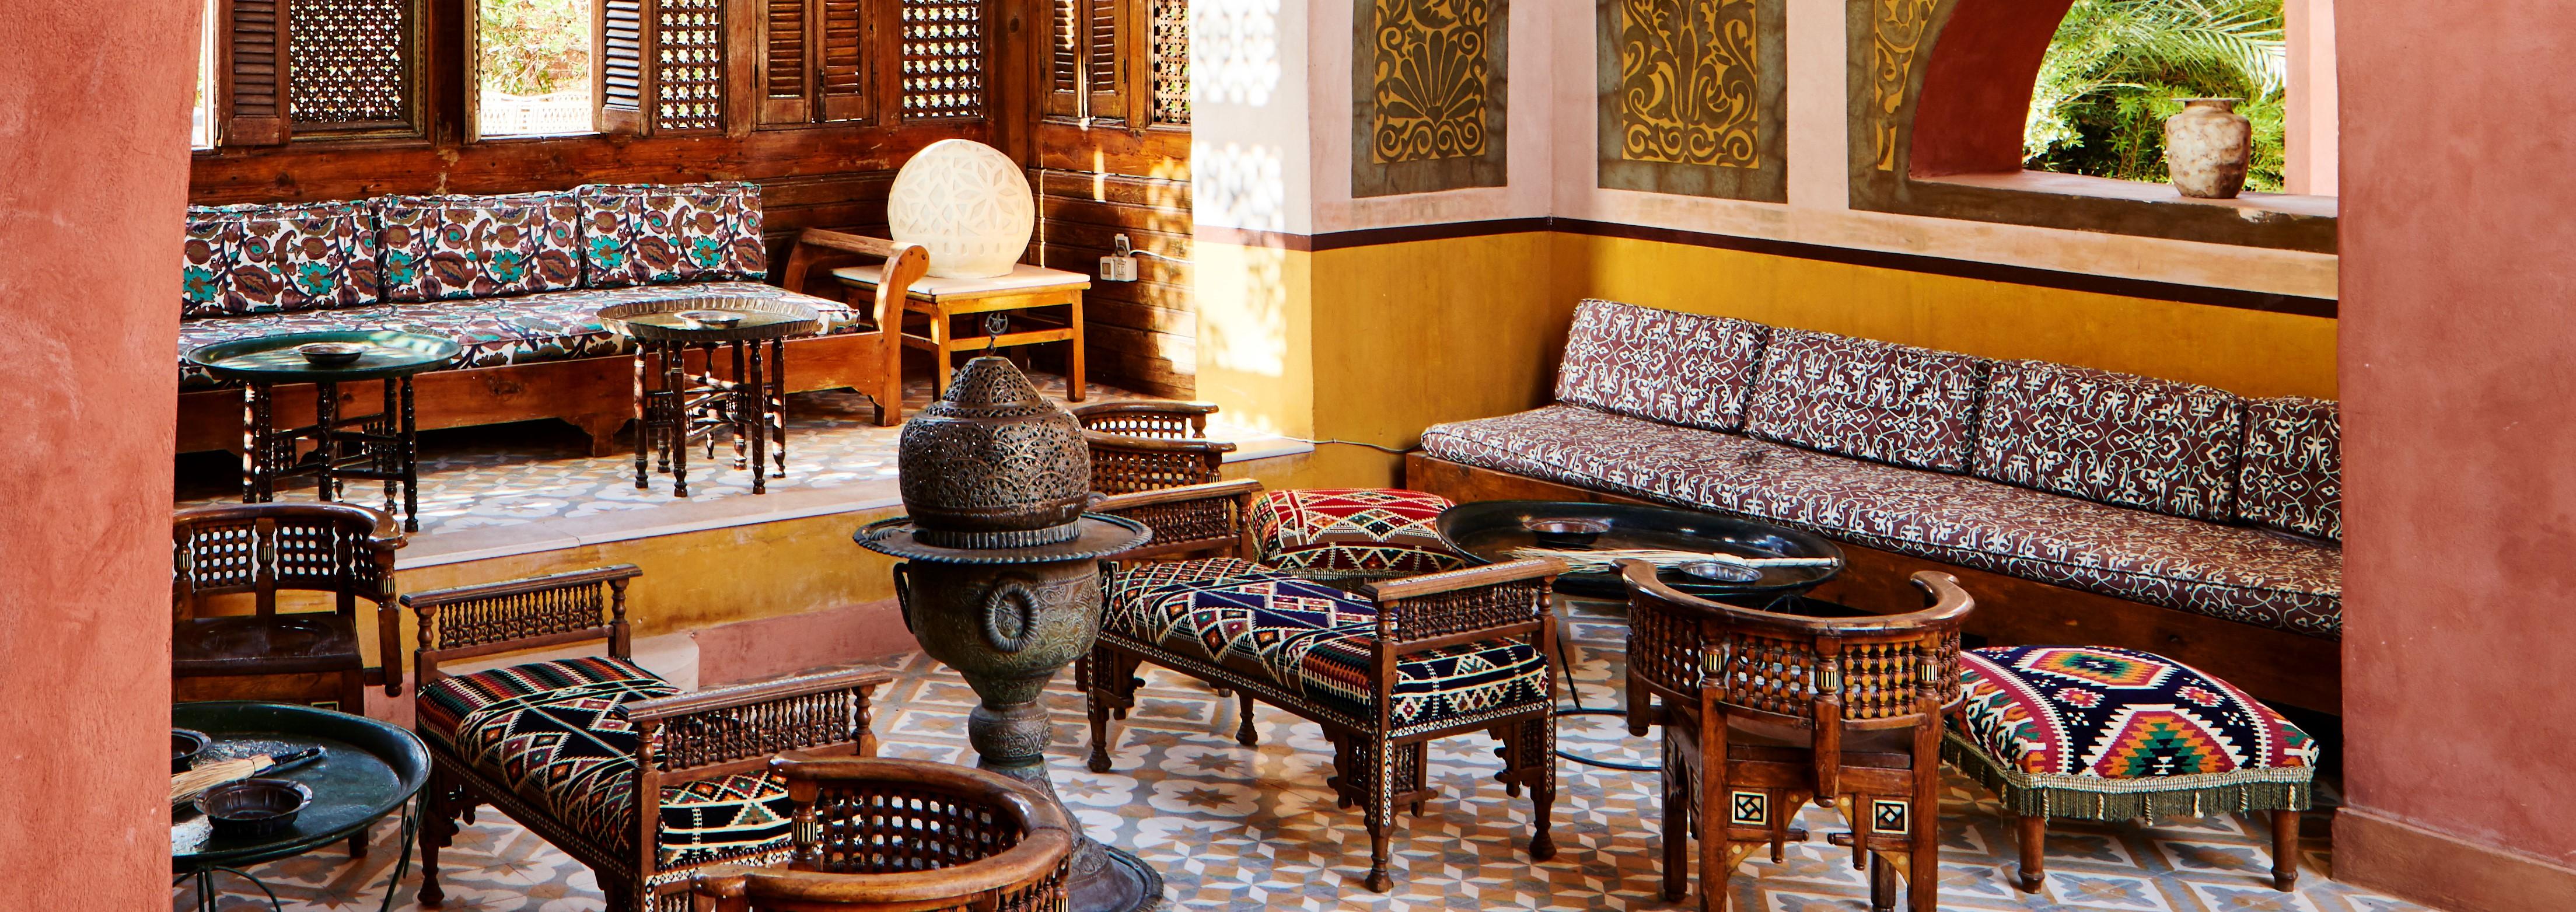 hotel-al-moudira-courtyard